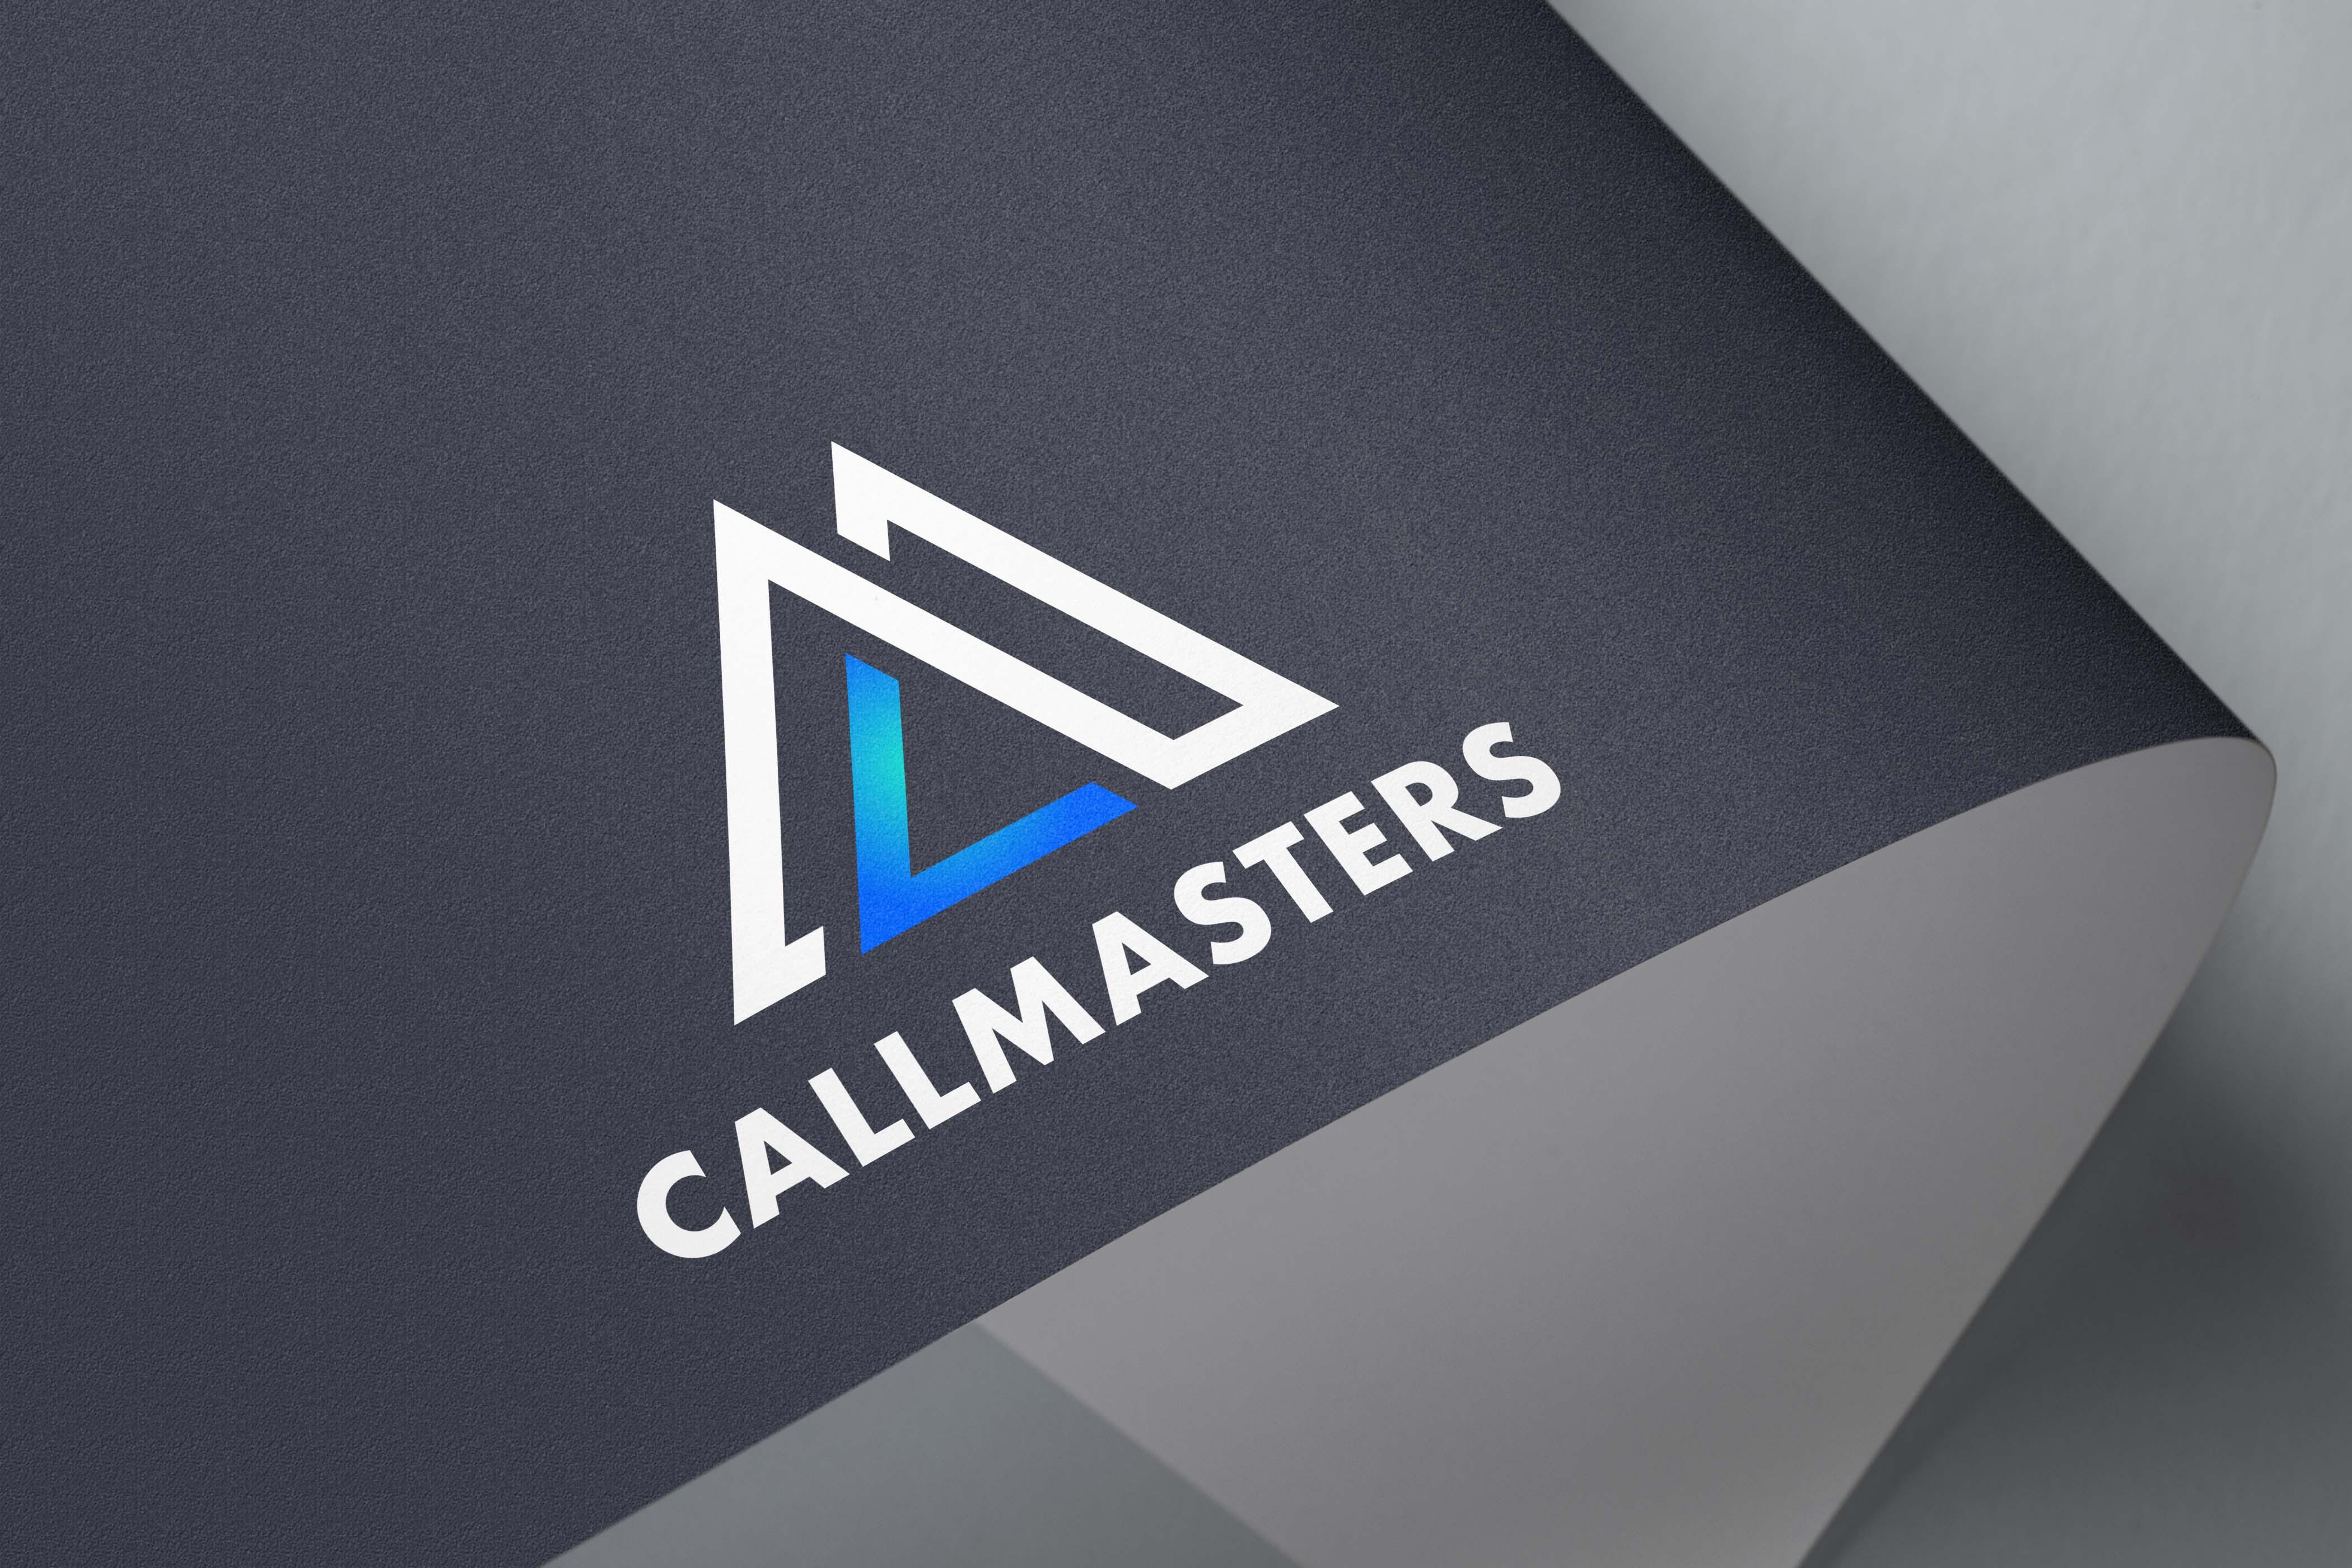 Логотип call-центра Callmasters  фото f_5925b6c9a7fc0bfd.jpg